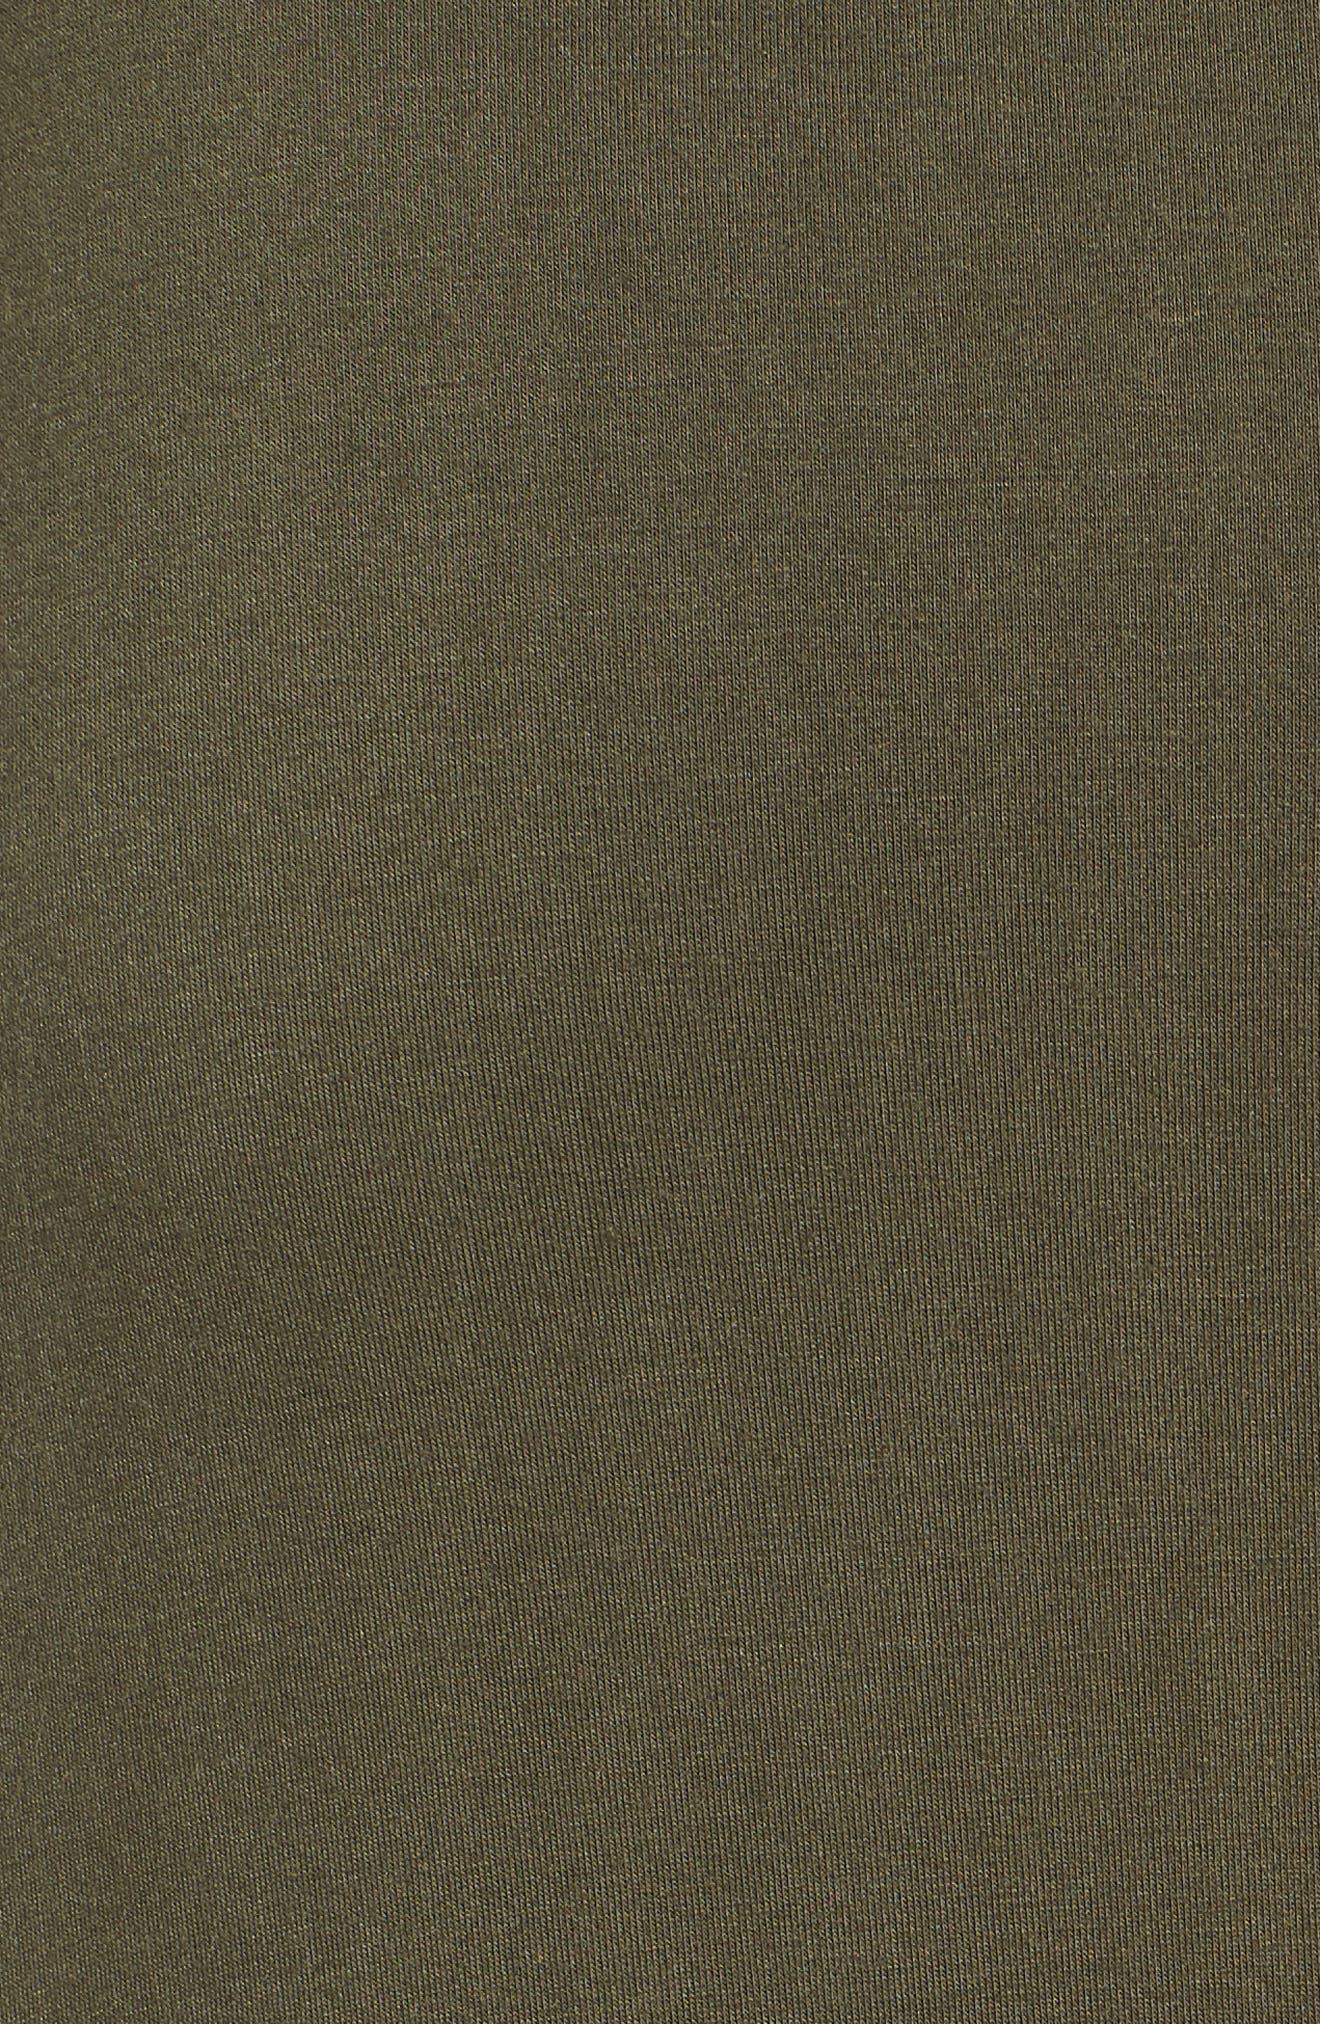 Ruched Waist Side Slit Maxi Skirt,                             Alternate thumbnail 5, color,                             302